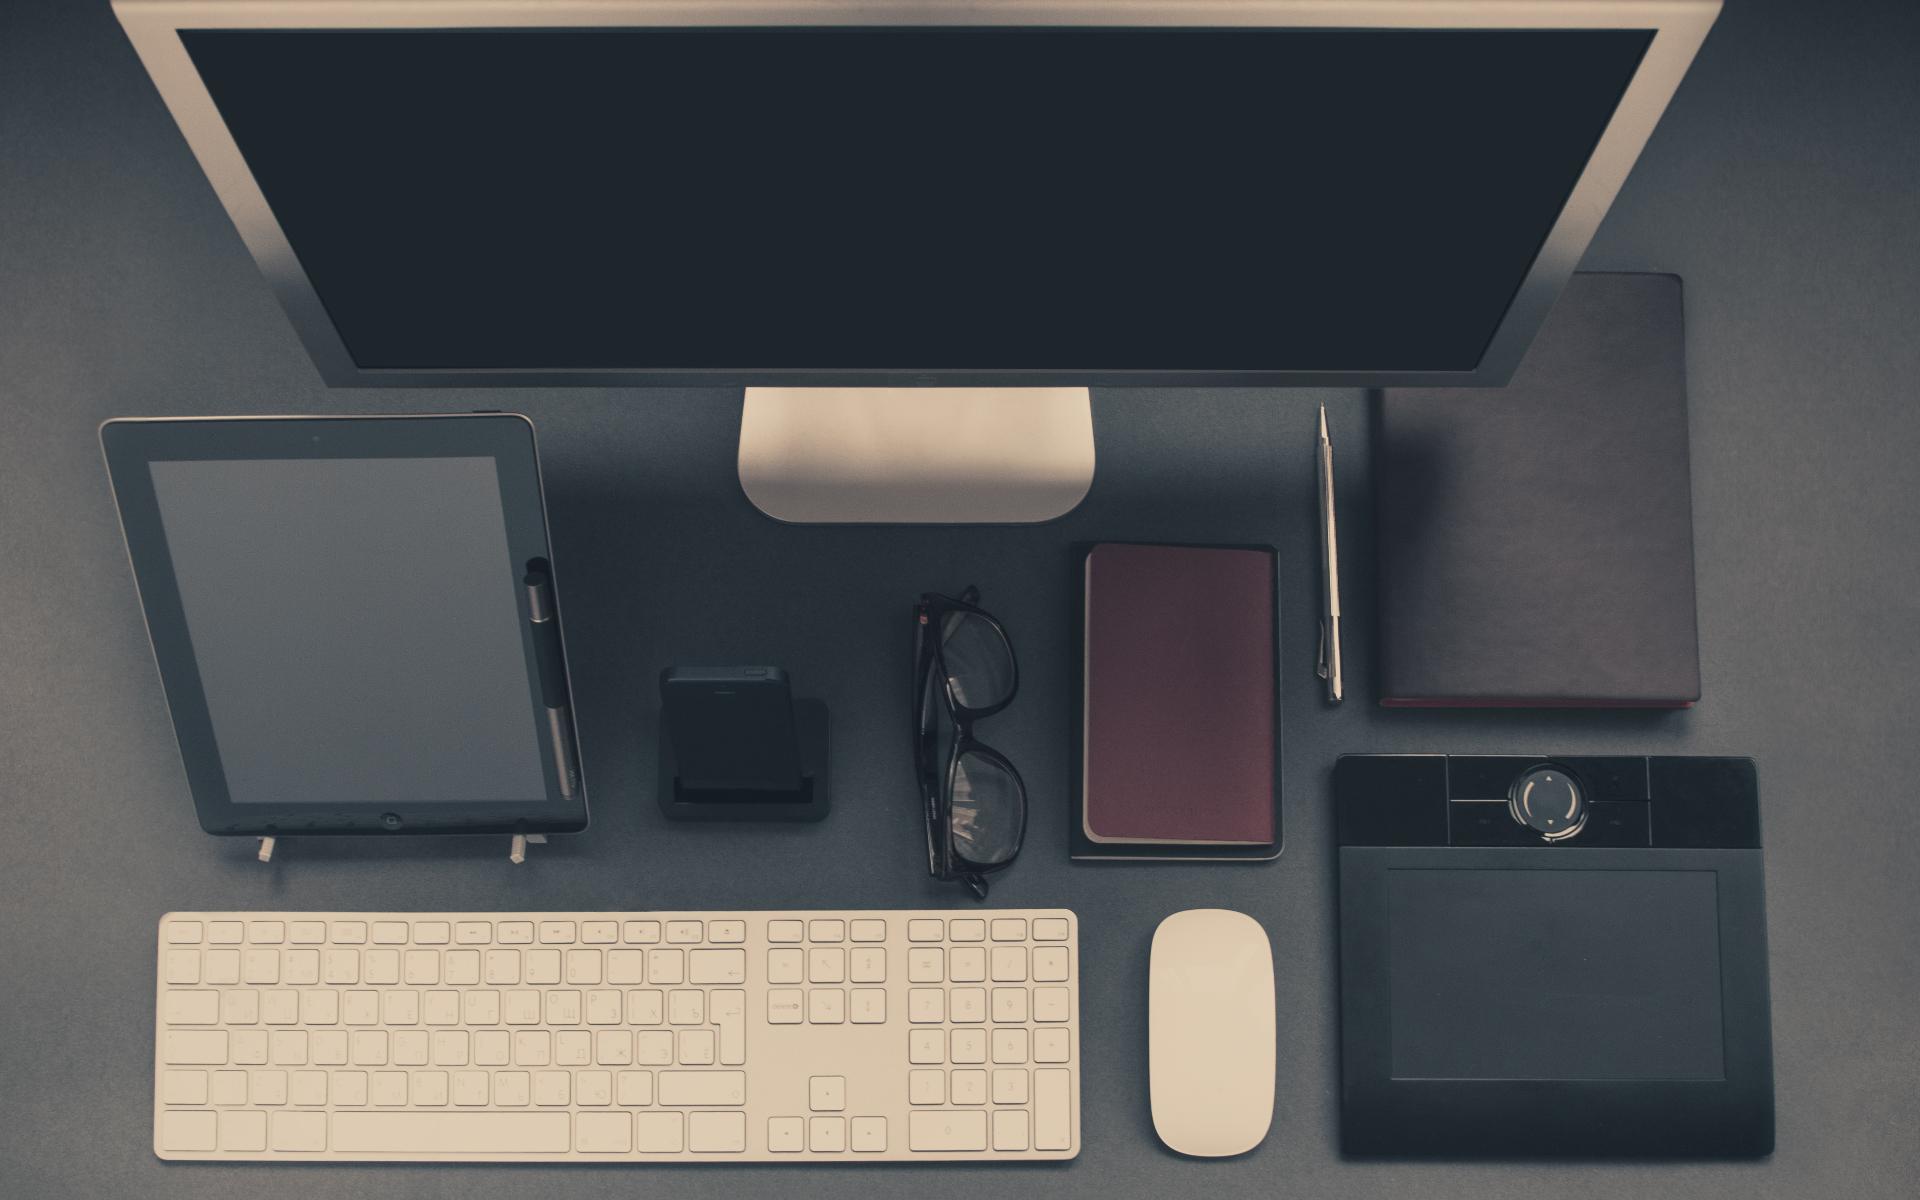 apple-iphone-desk-office.jpg